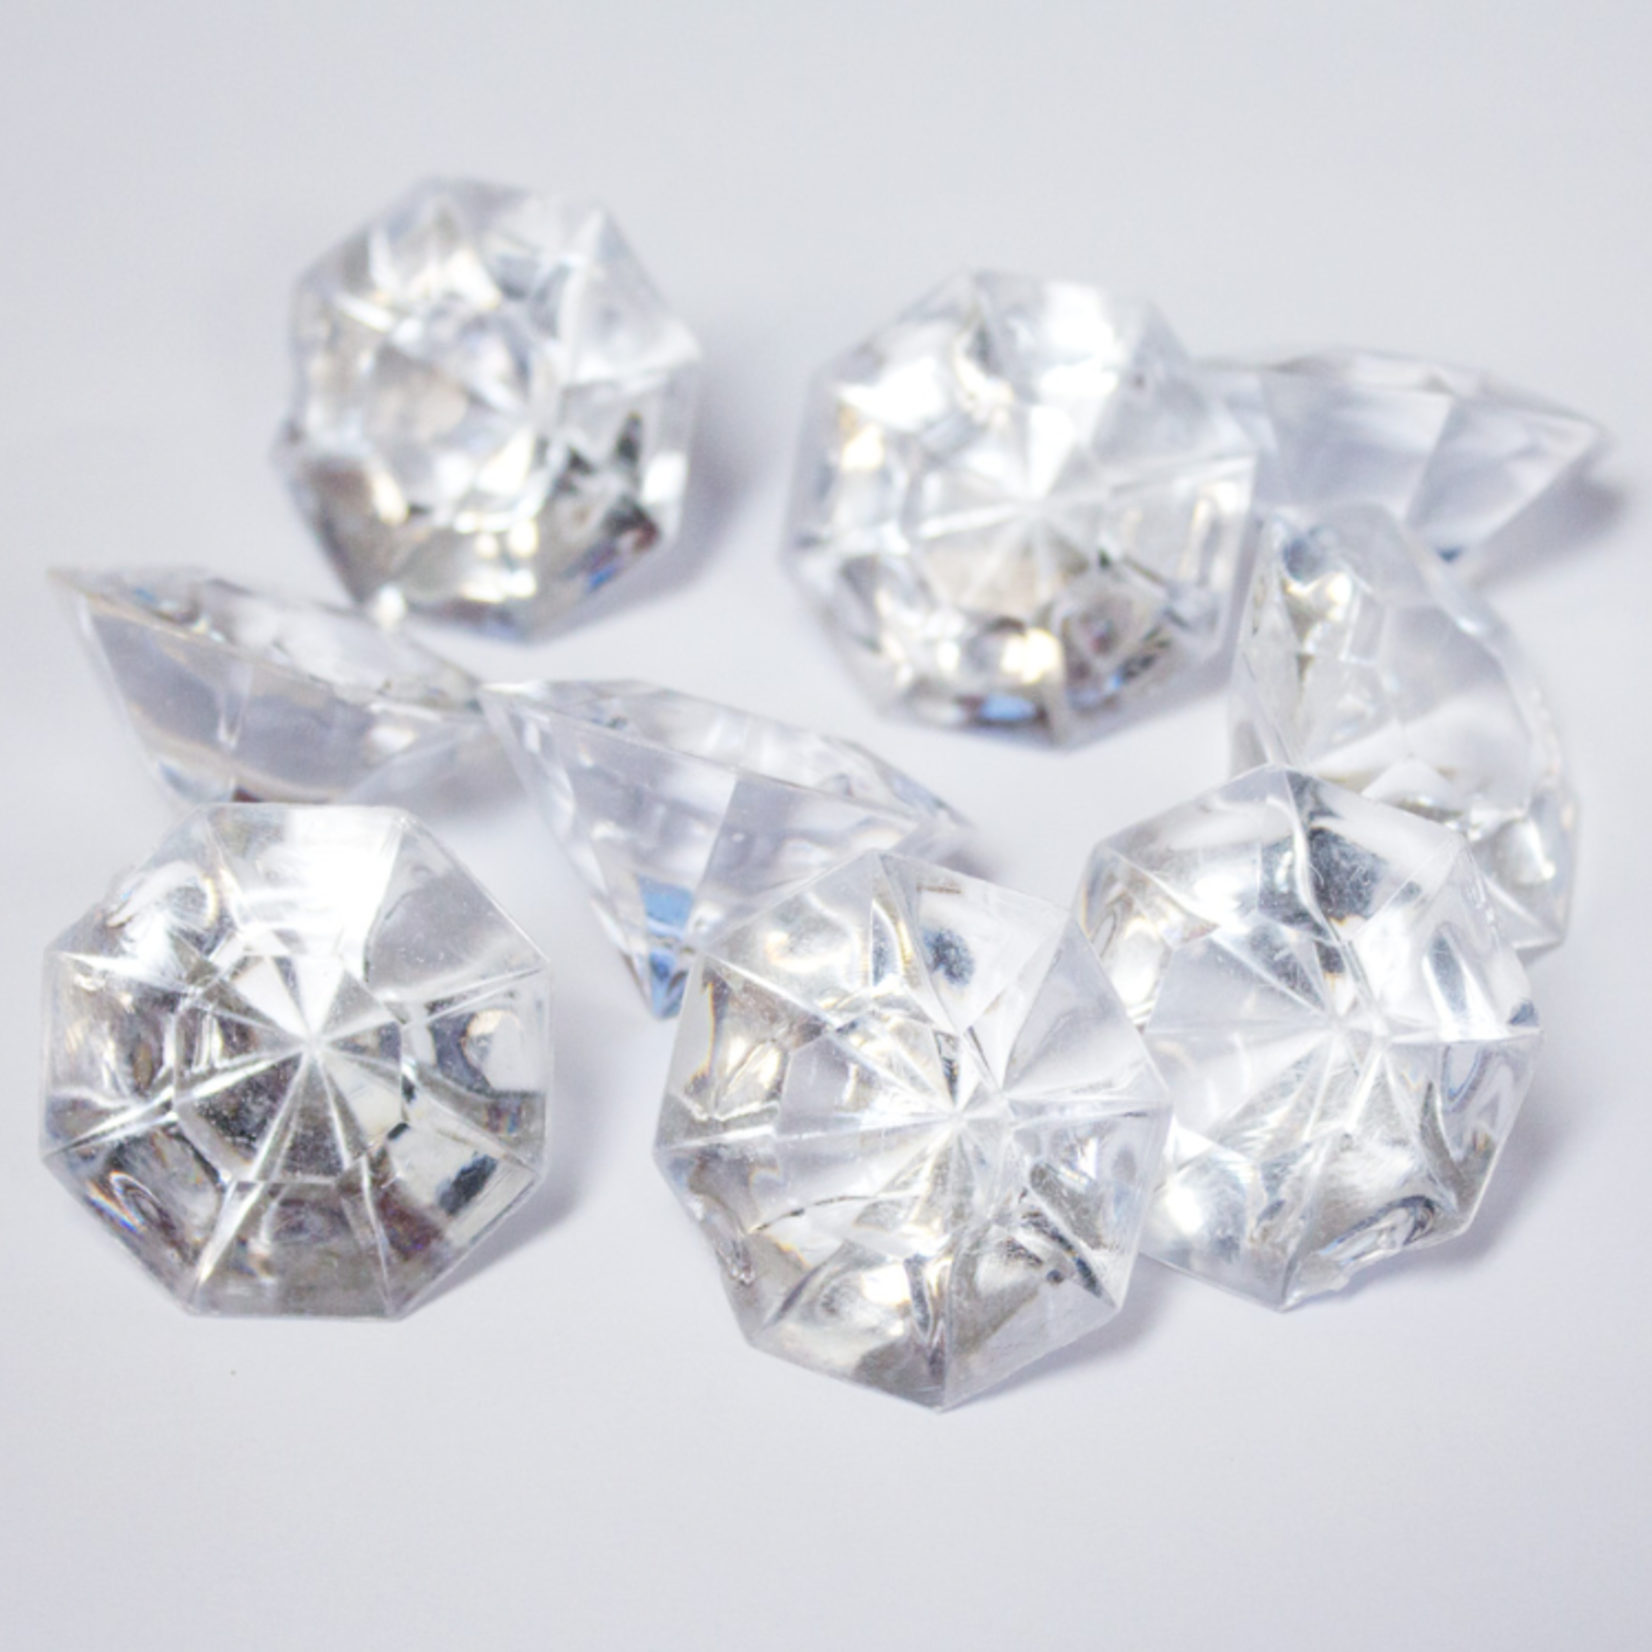 1 LB BAG CLEAR DIAMONDS